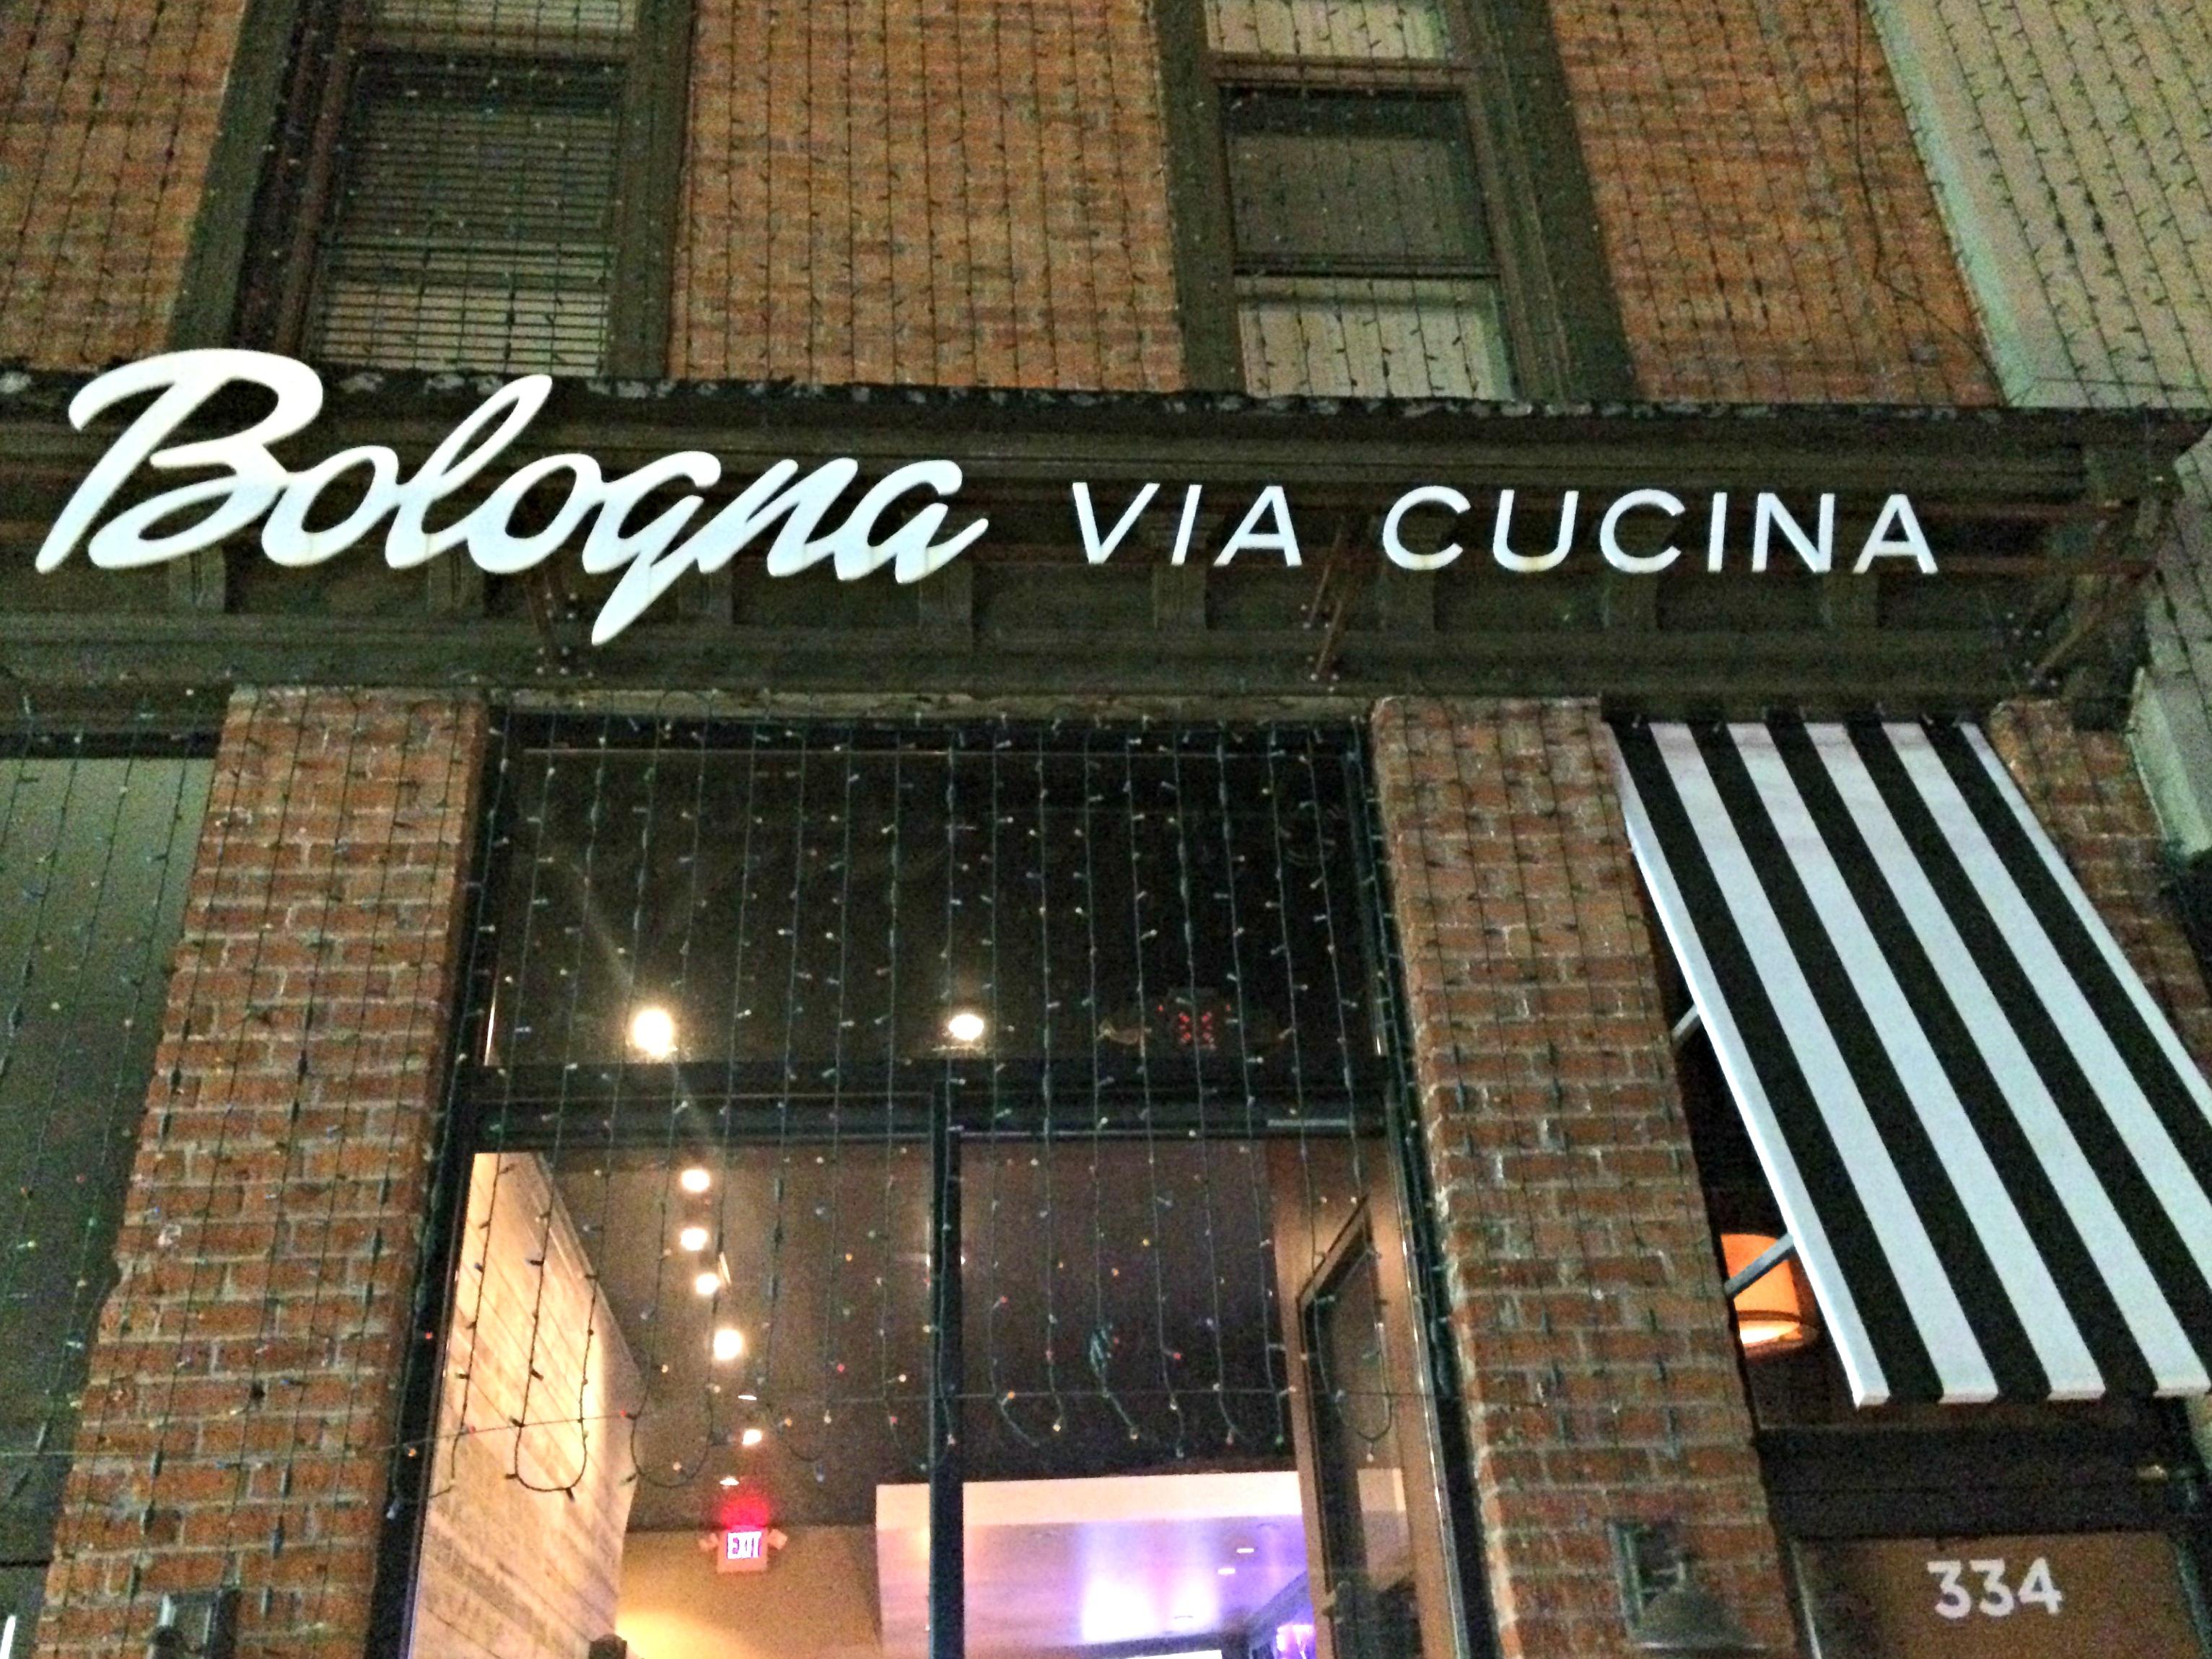 Bologna Via Cucina Rochester Michigan